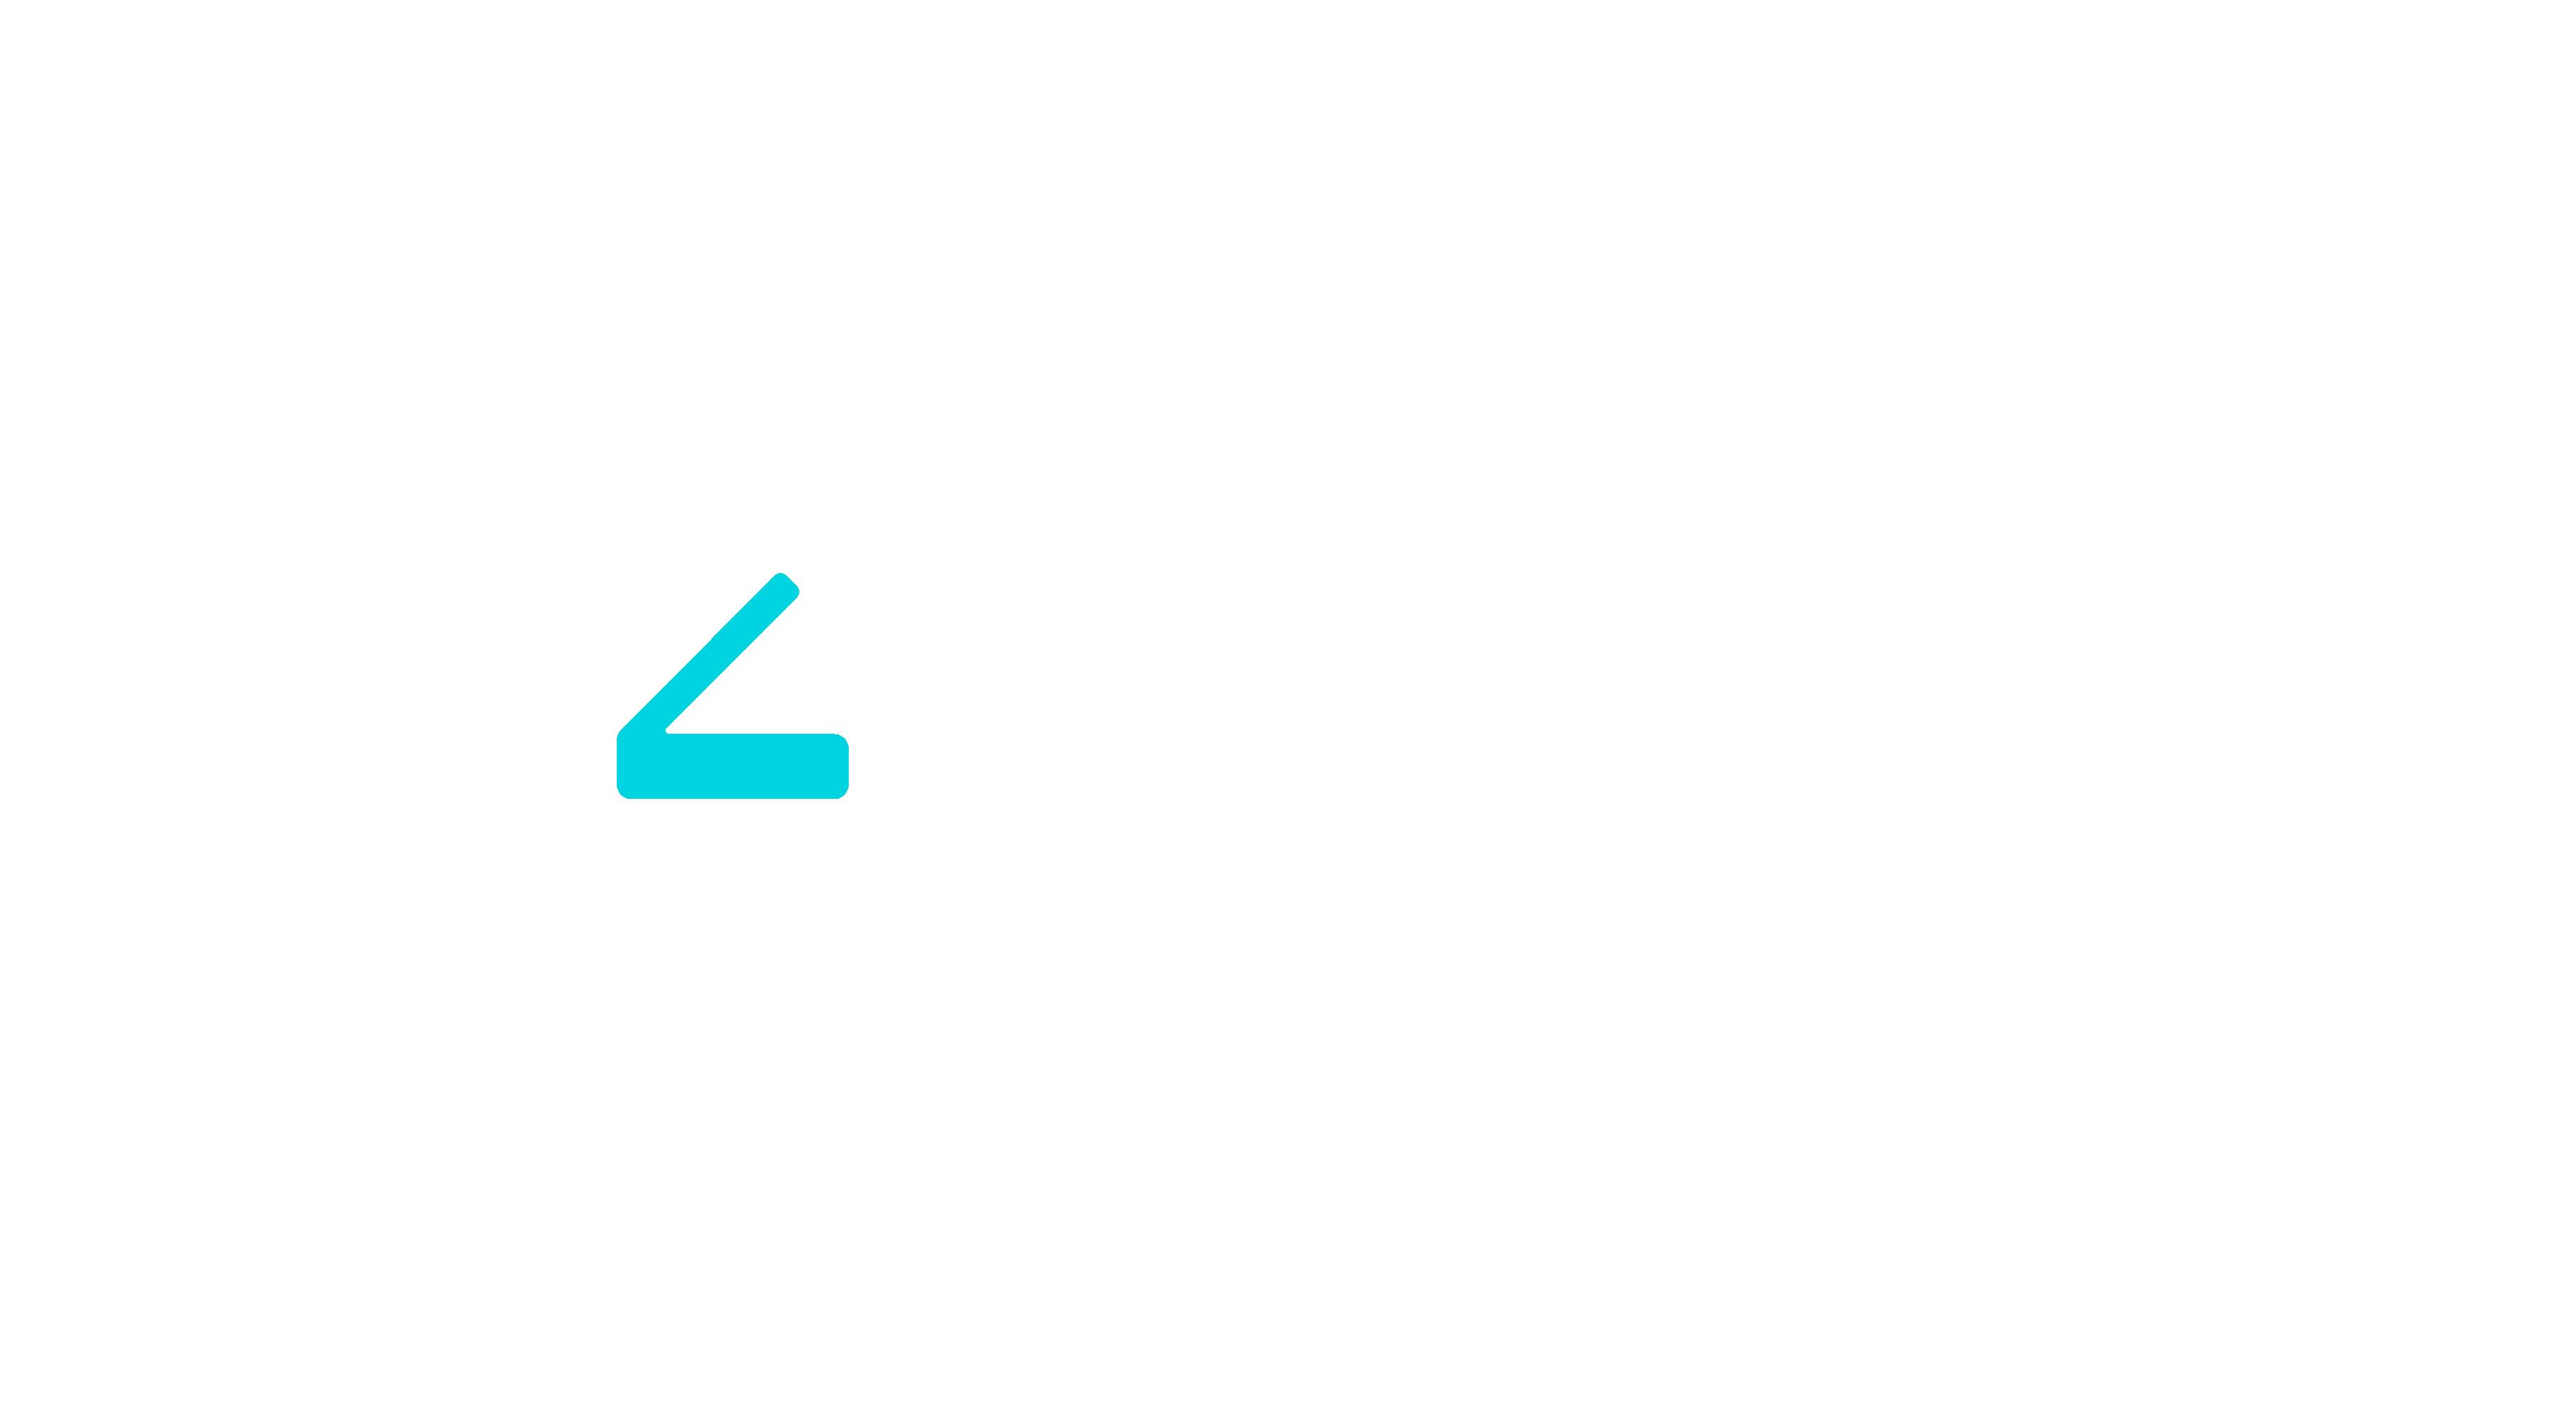 softpoint qread logo white